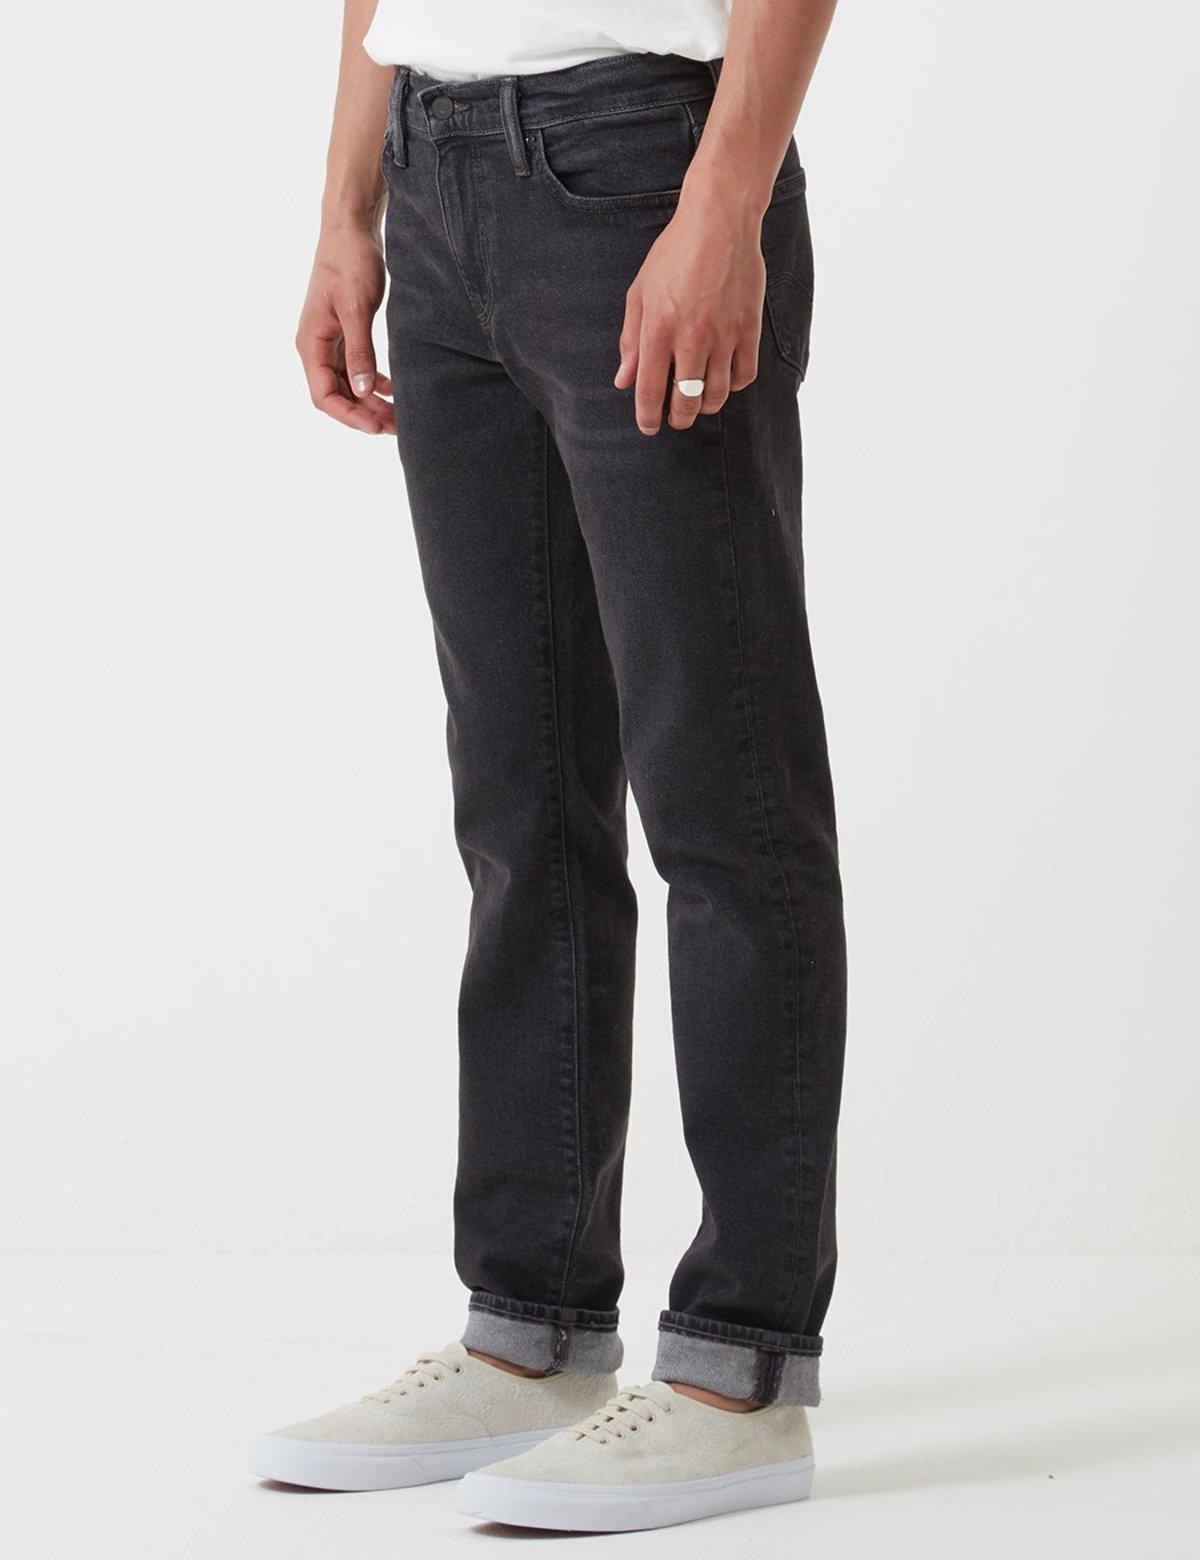 ce13cf1b03d Levi's 511 Slim Performance Fit Jeans - Lorimer Indigo | Garmentory